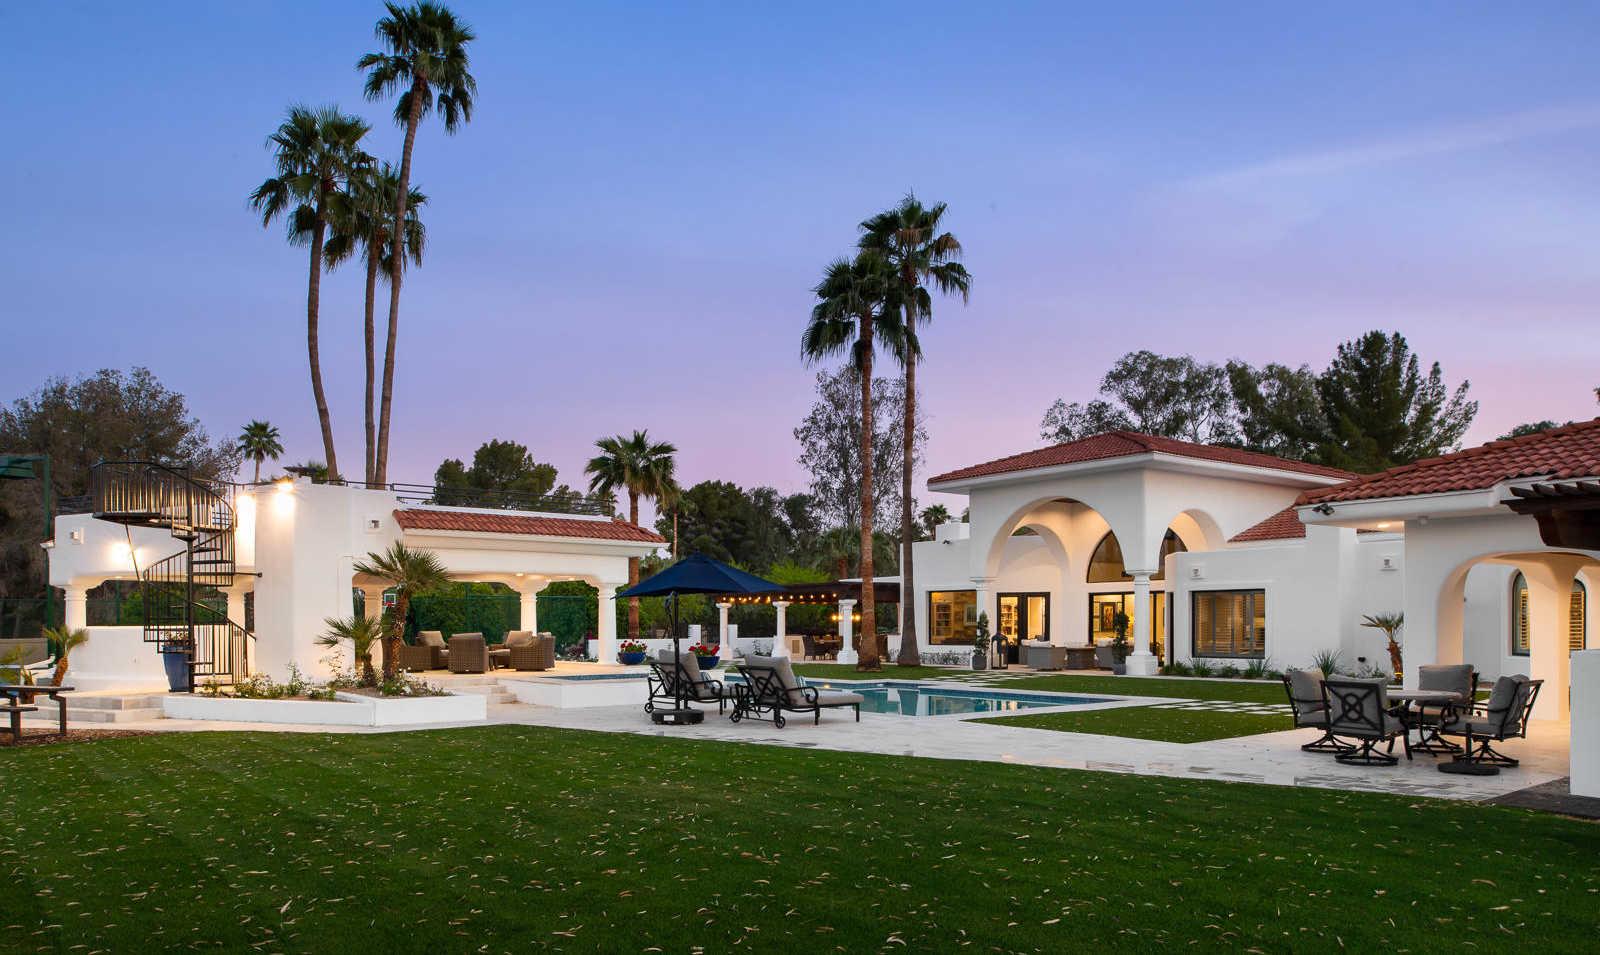 $5,950,000 - 5Br/7Ba - Home for Sale in Hidden Lane Estates, Paradise Valley